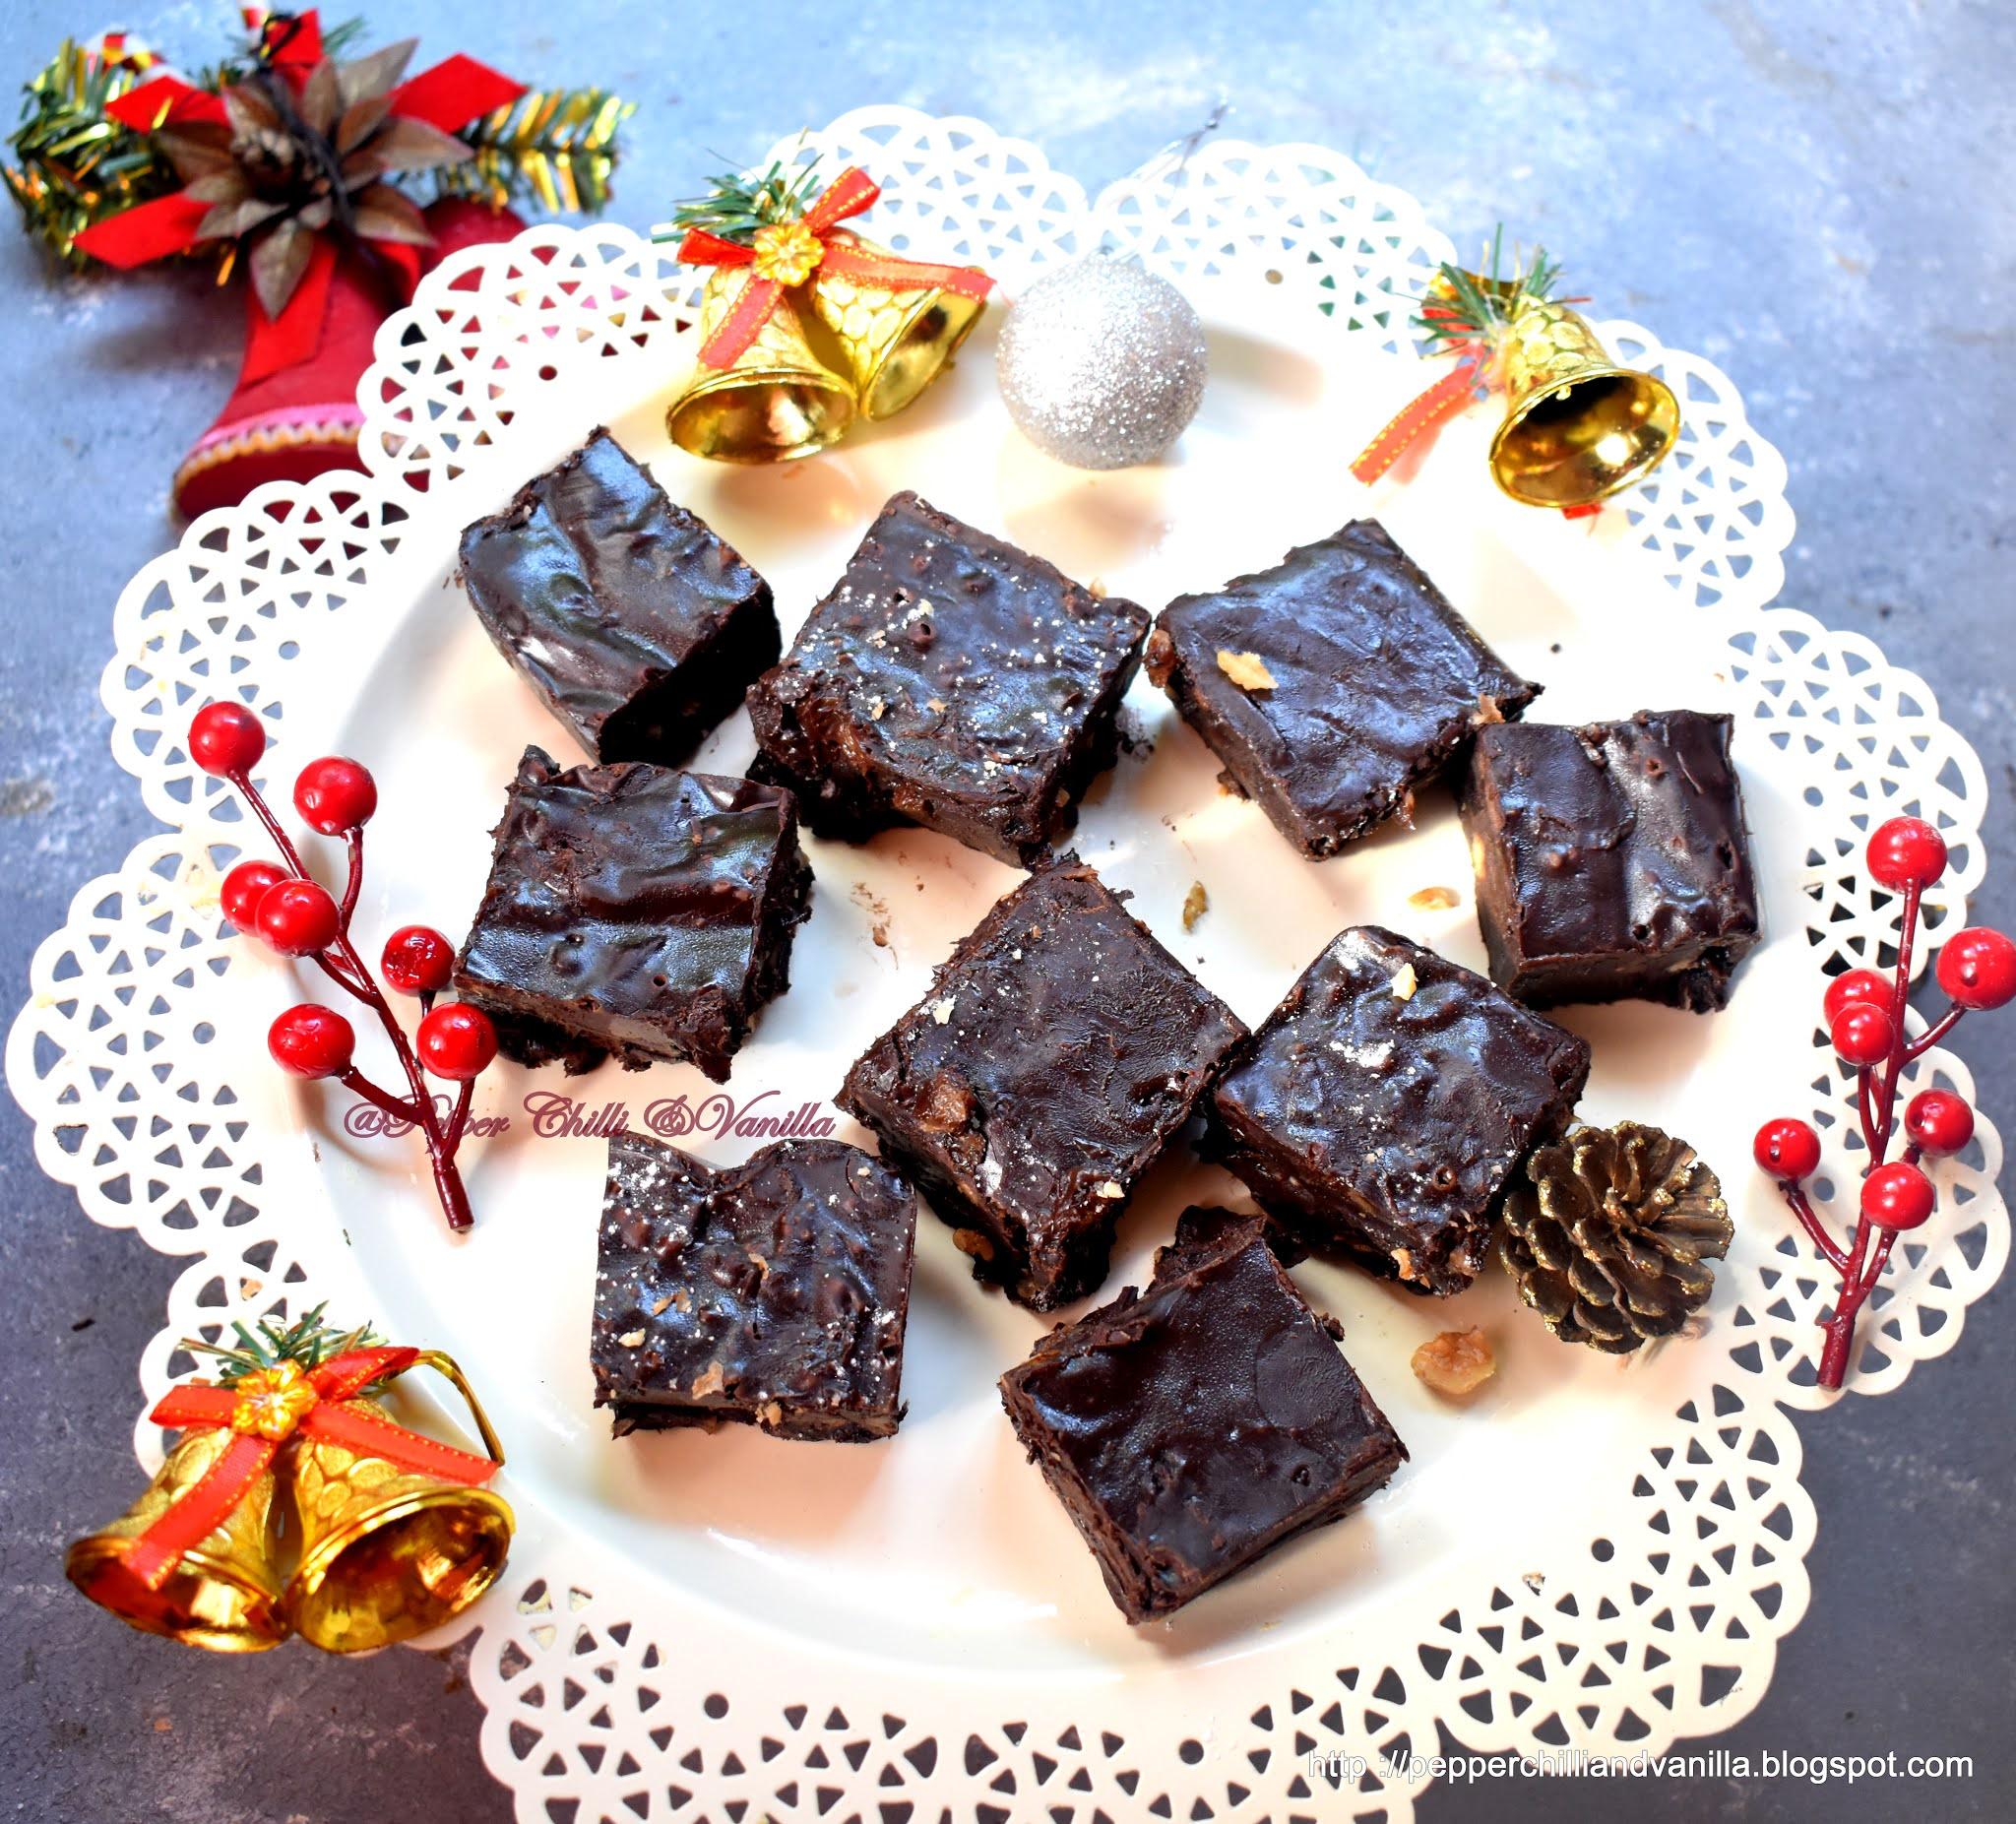 rum and raisins fudge, chocolate fudge, dark chocolate fudge